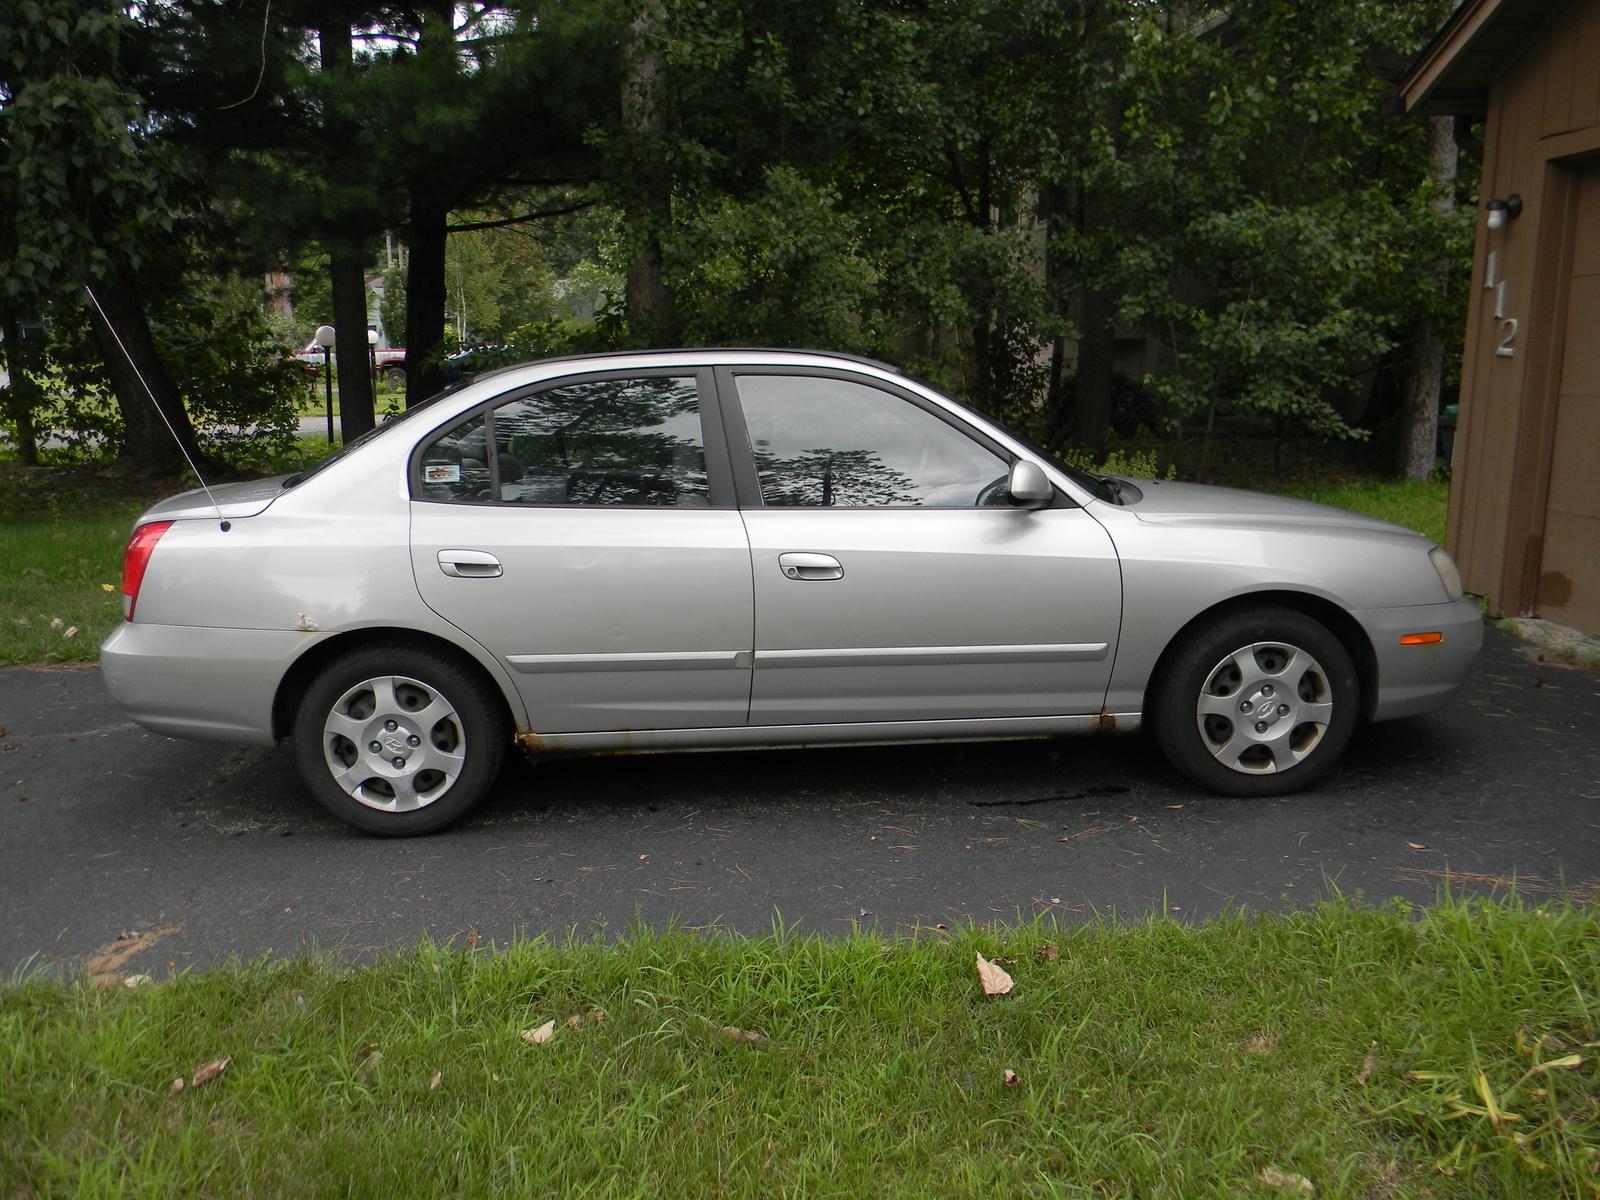 2002 Hyundai Elantra Image 12